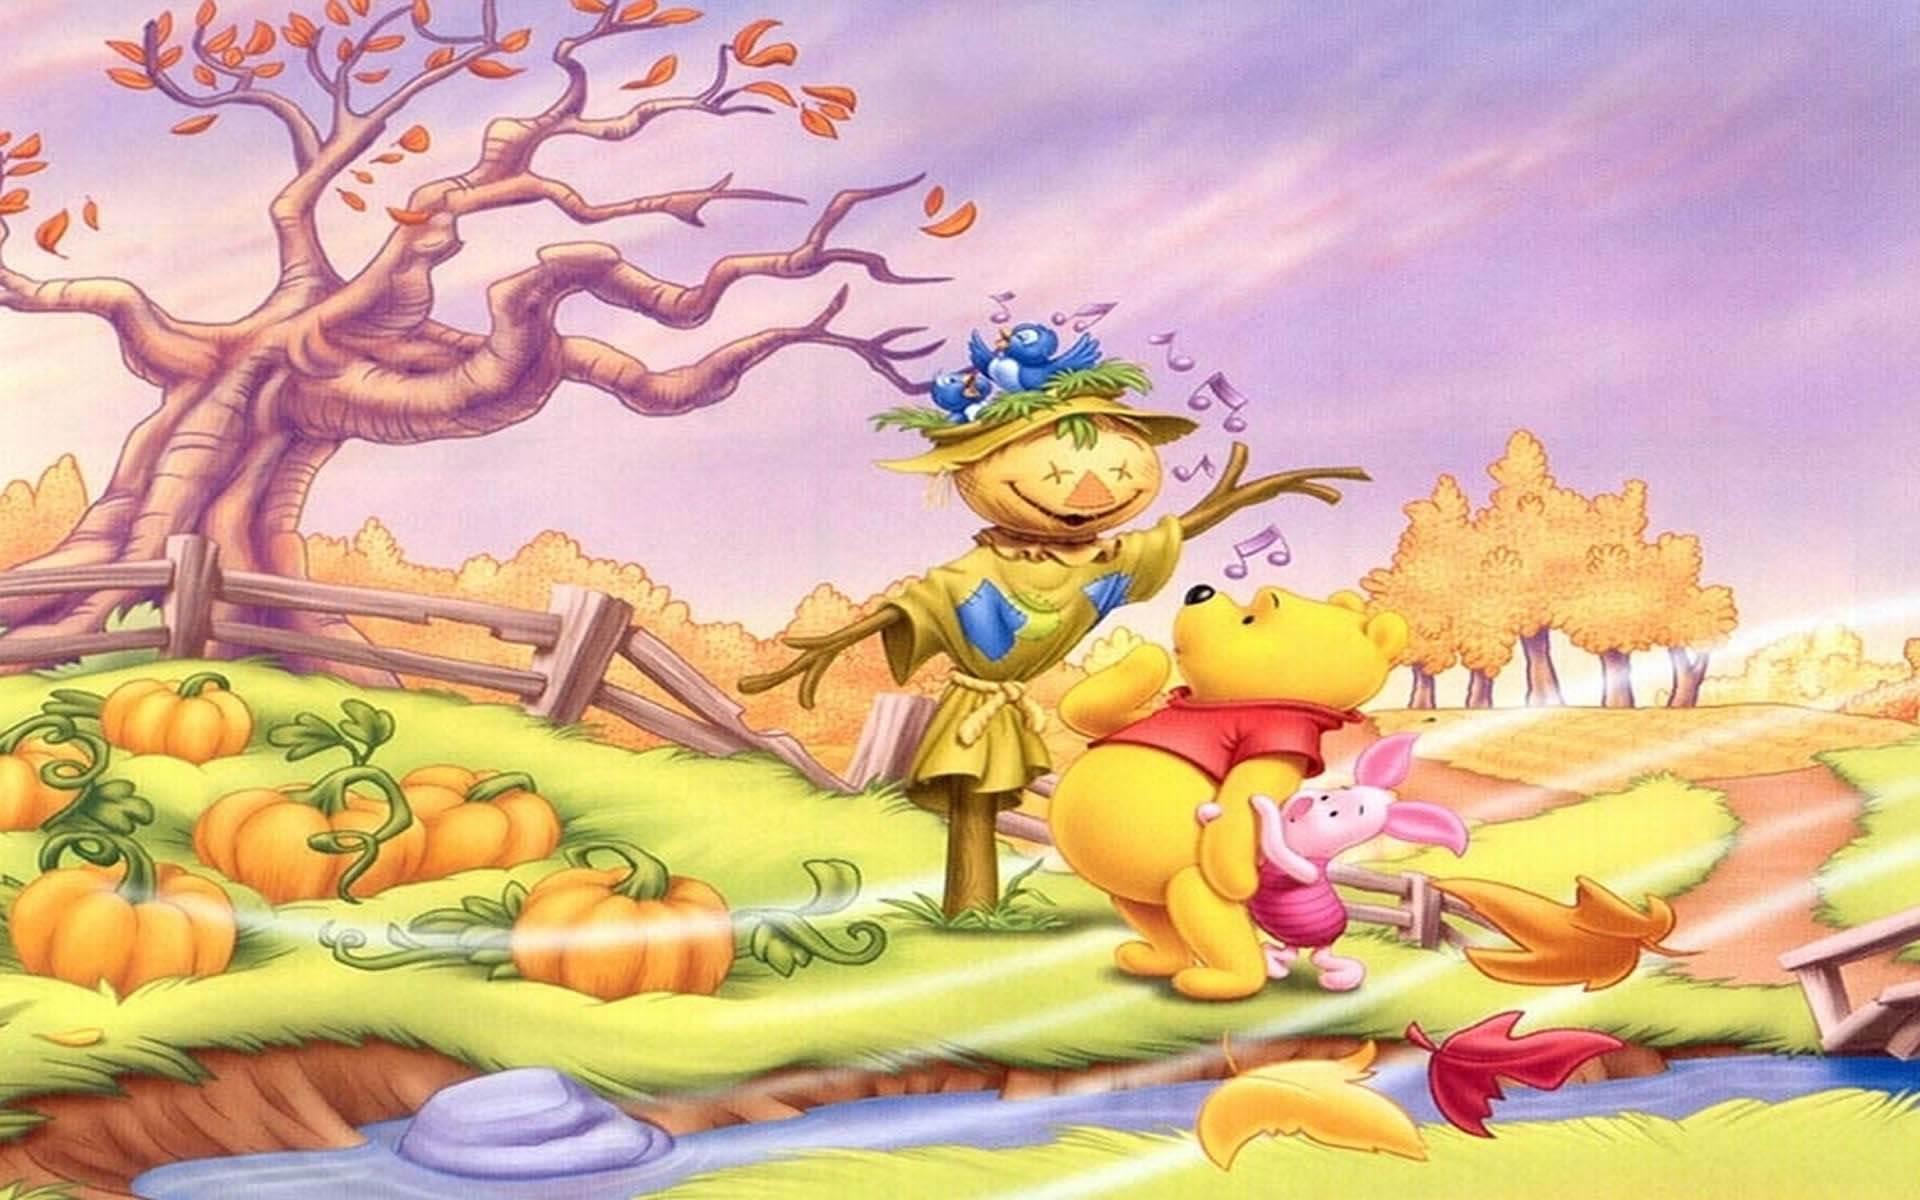 Winnie The Pooh Quotes Wallpaper QuotesGram 1920x1200